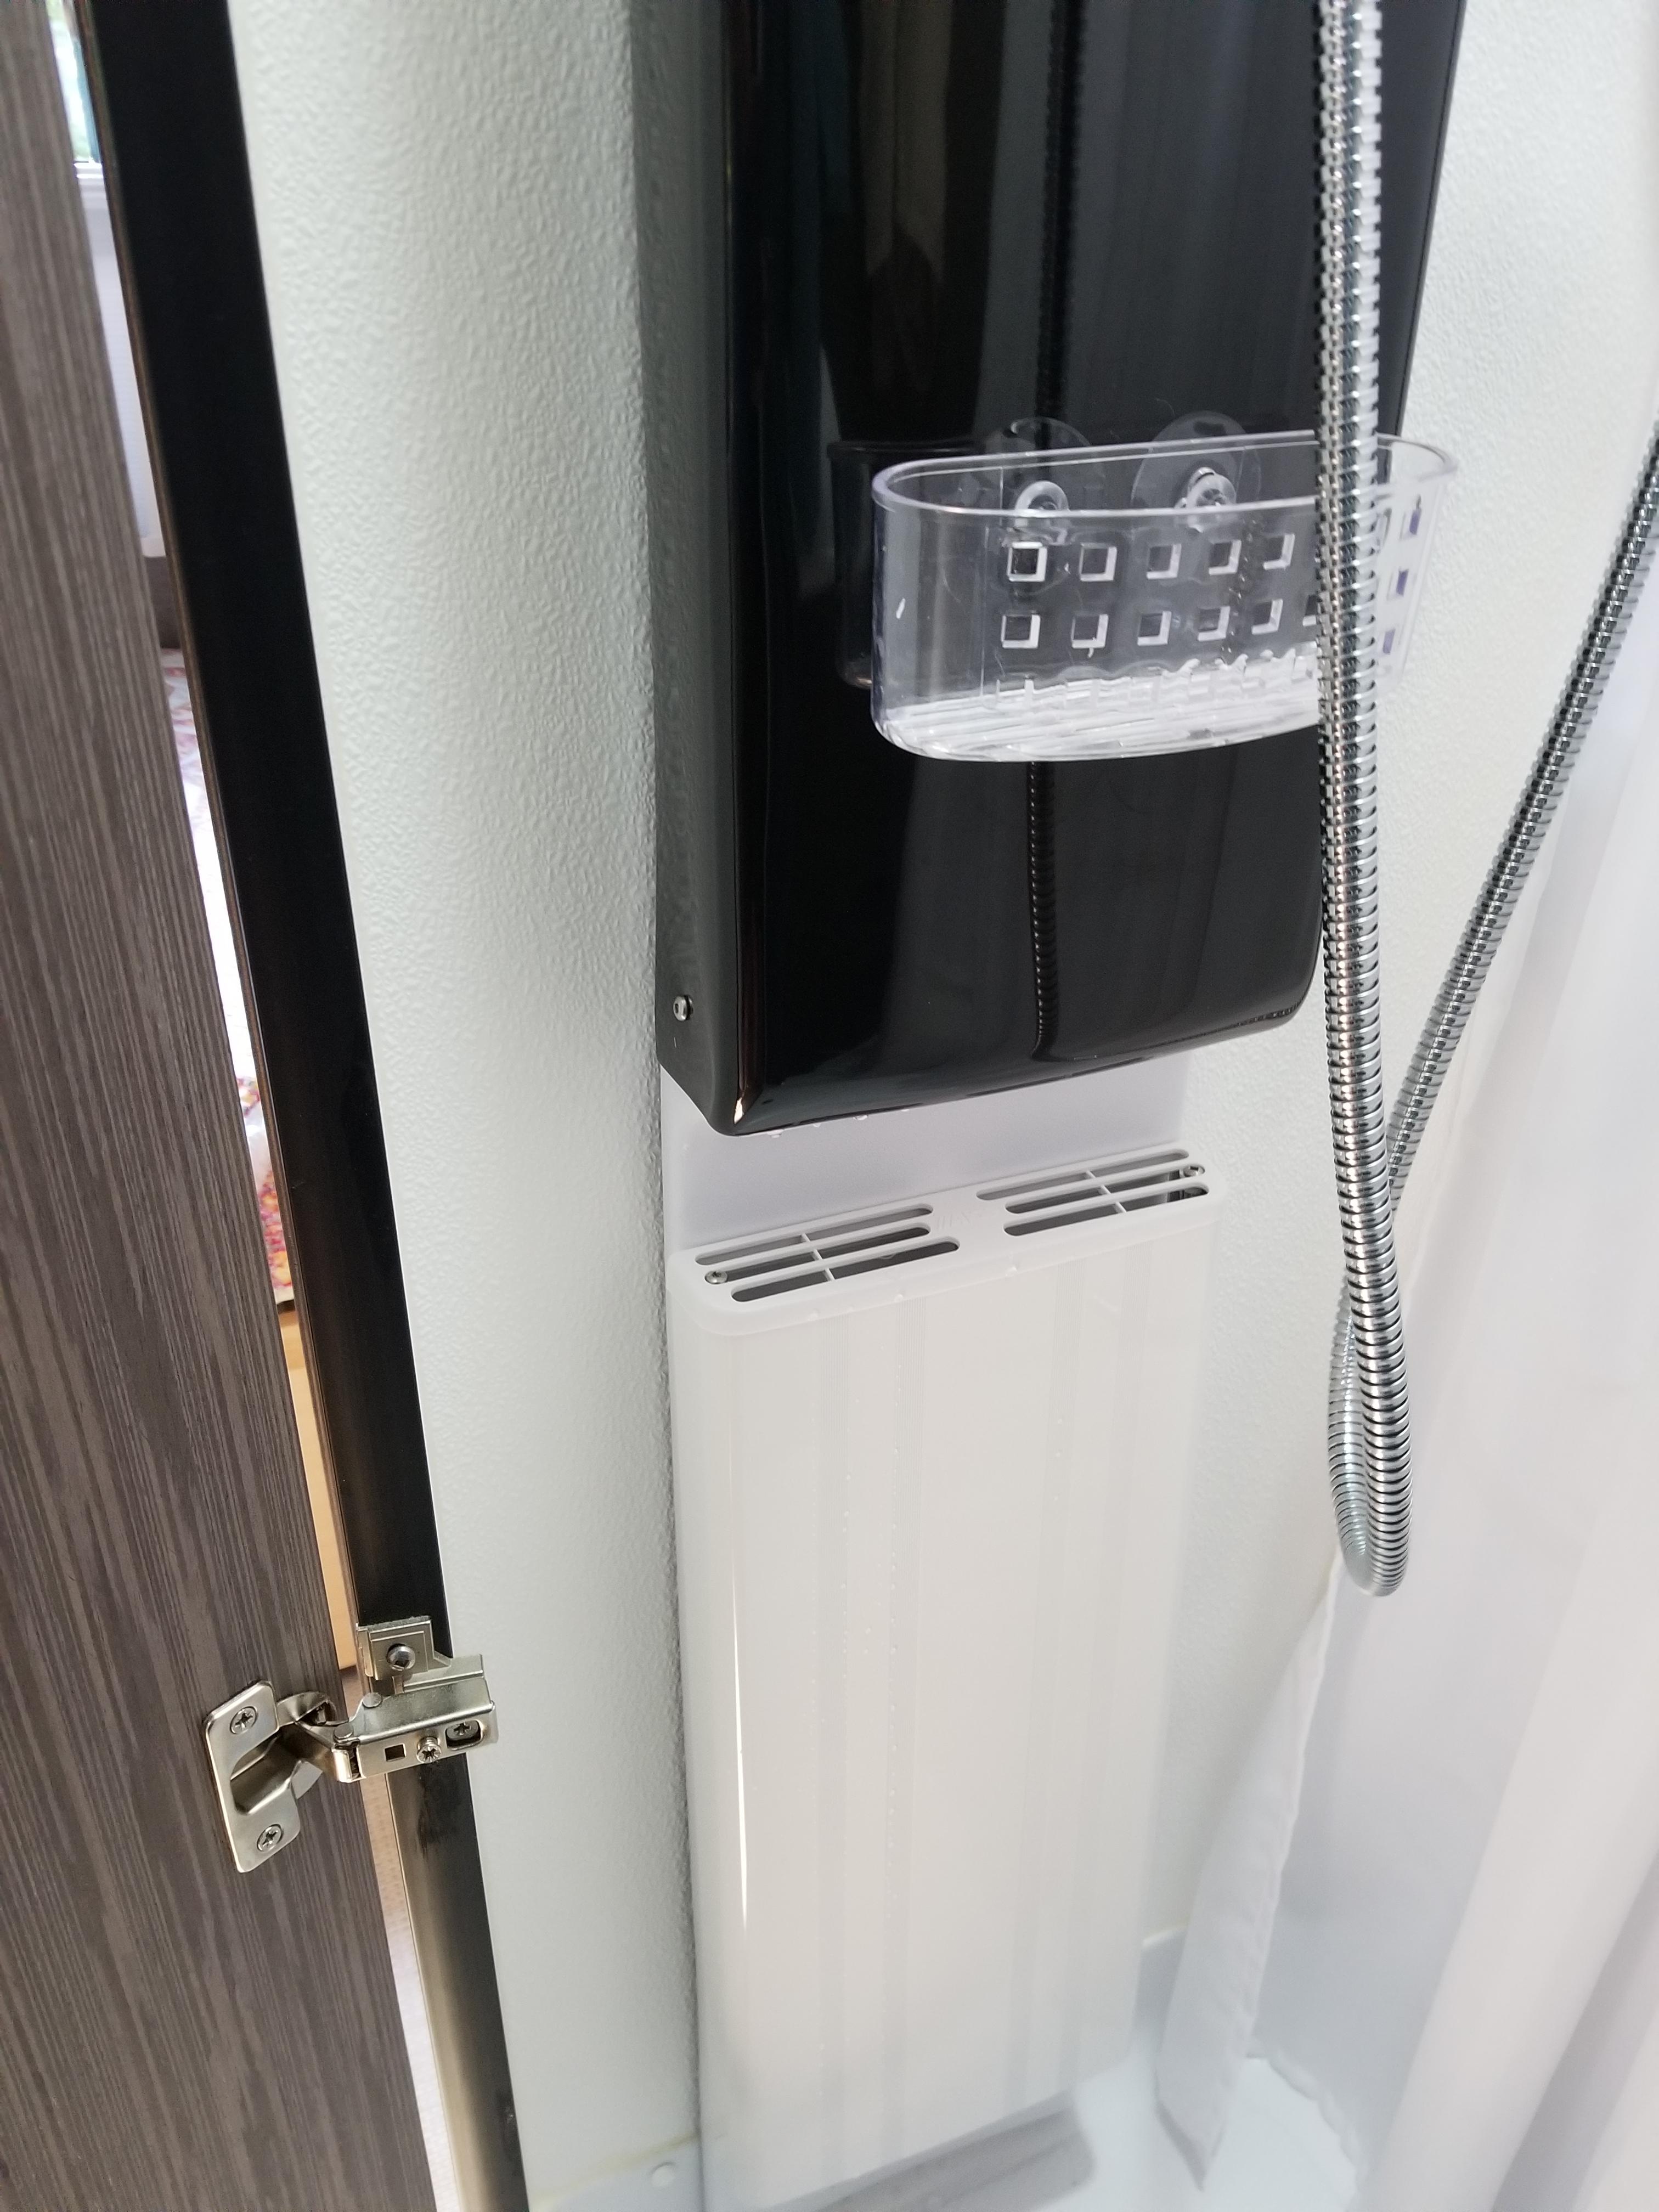 TAB400 Shower Faucet Leak ?